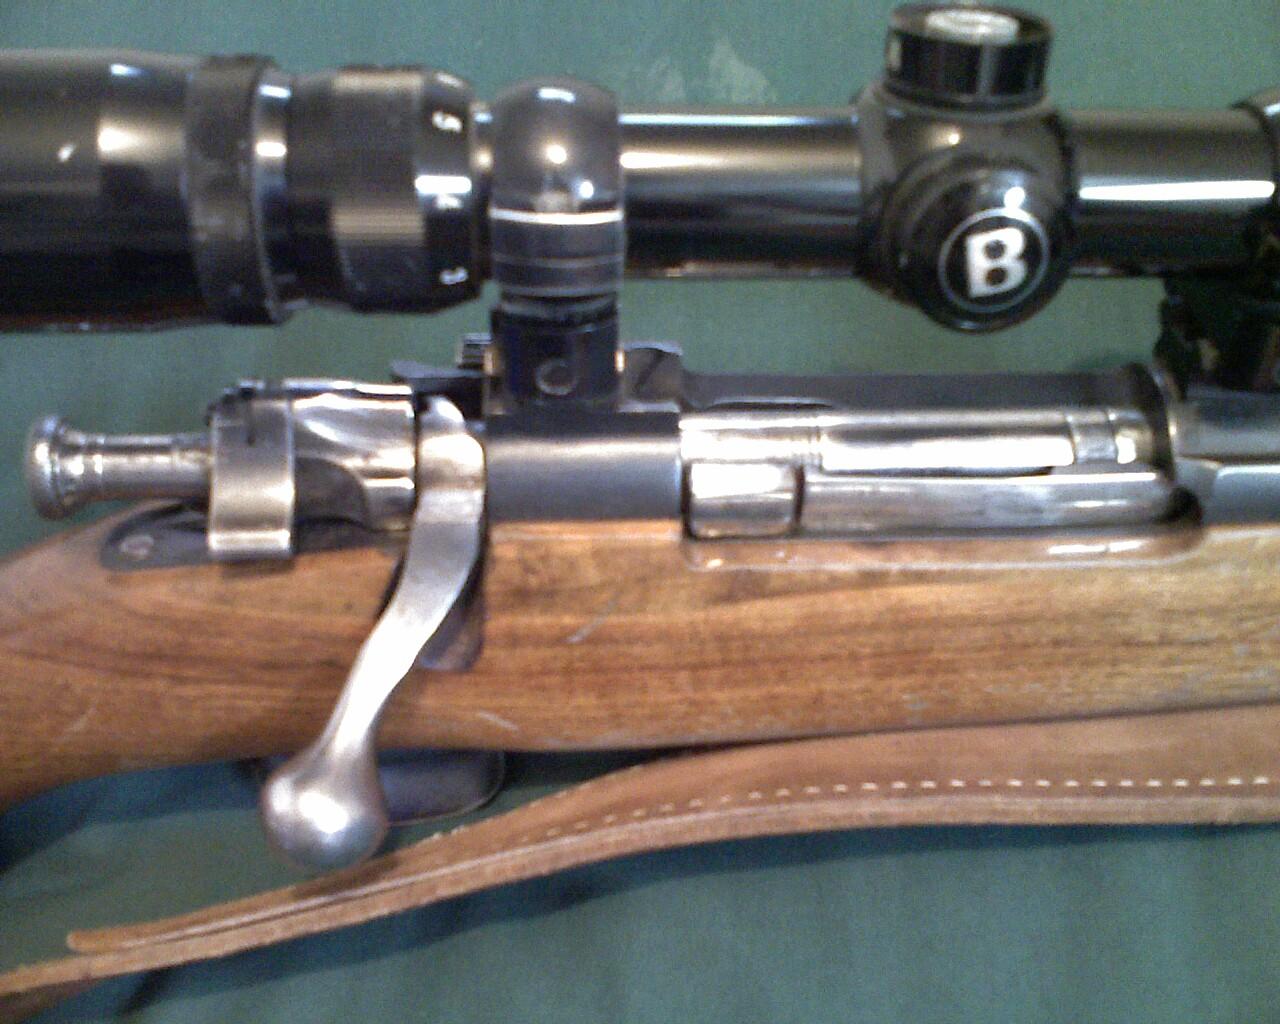 A few pics of my guns-photo_031609_001.jpg